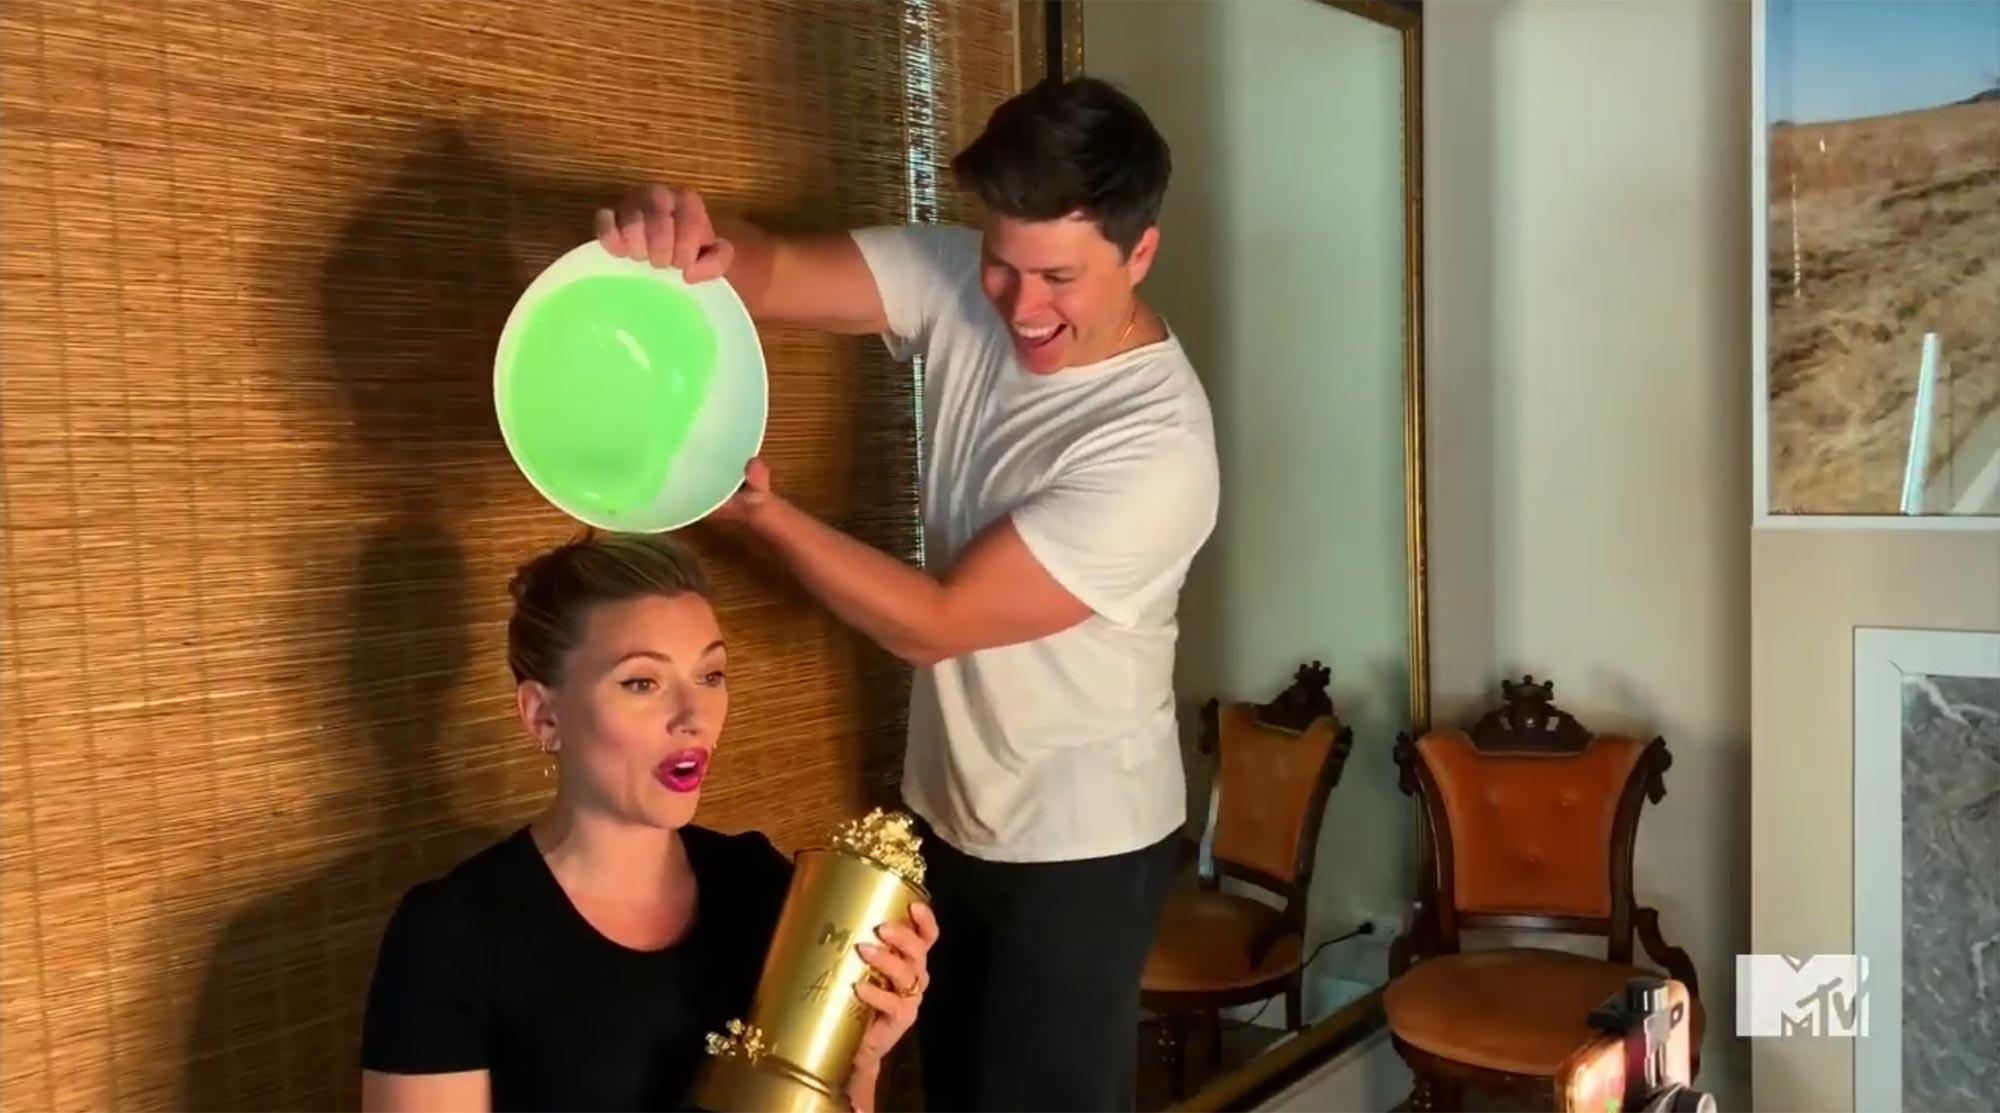 Colin Jost Slimes Scarlett Johansson During Acceptance Speech